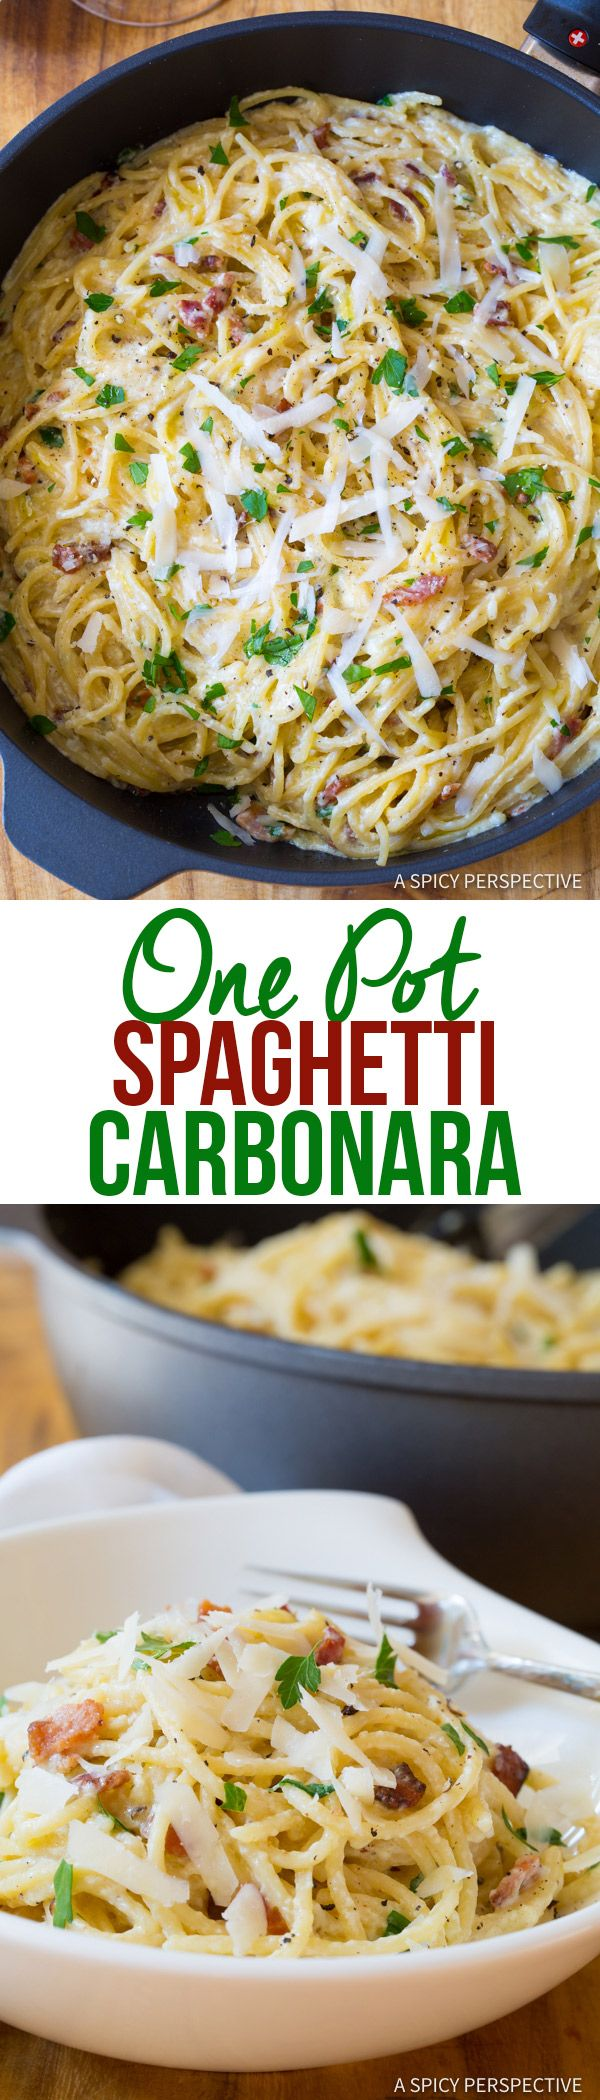 The Ultimate One Pot Spaghetti Carbonara | ASpicyPerspective.com. Use Dreamfields pasta.